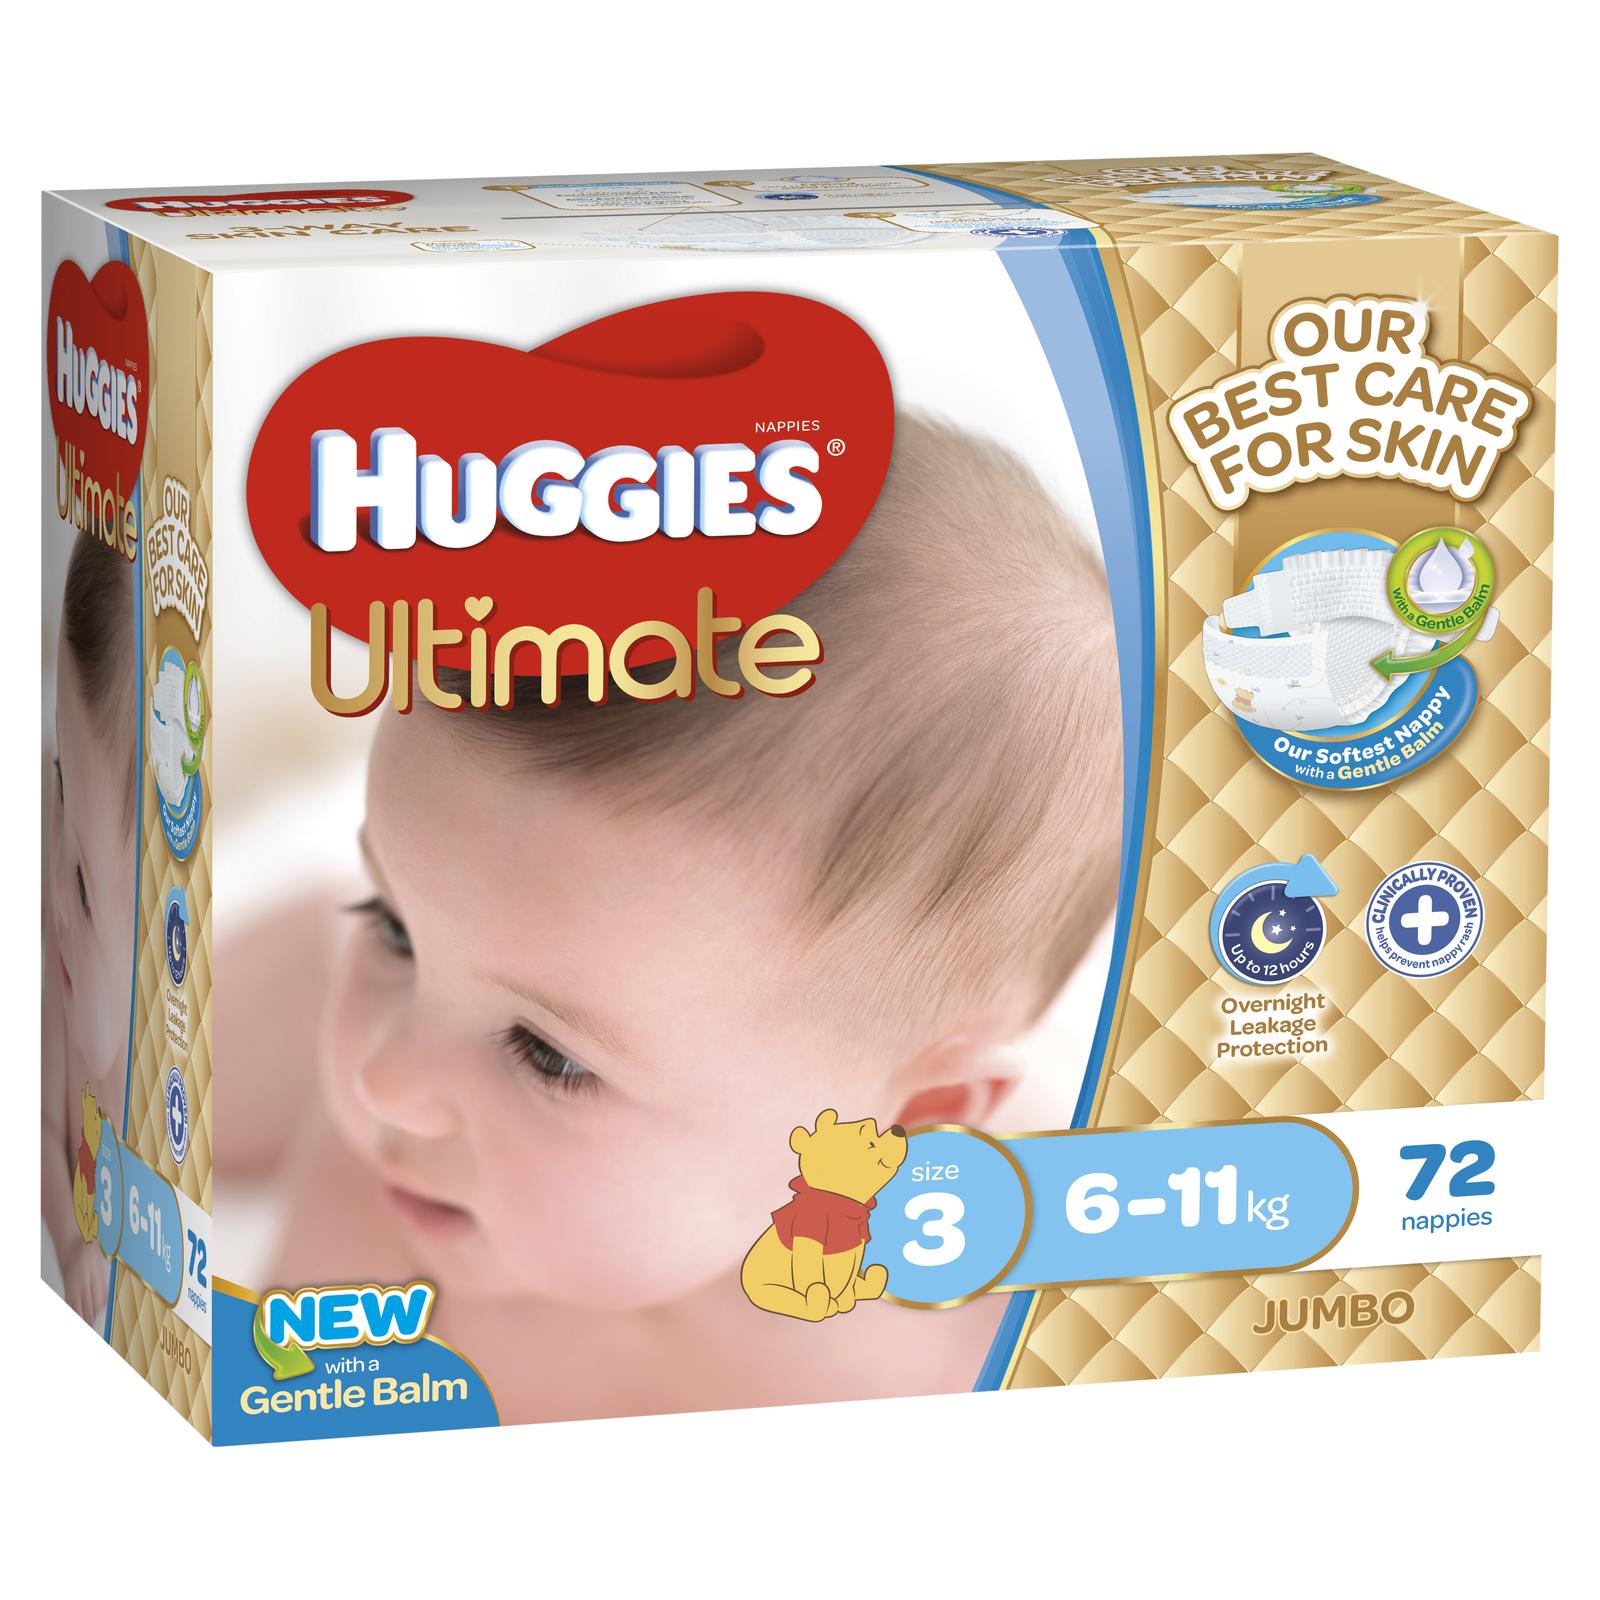 Huggies Ultimate Nappies: Jumbo Pack - Crawler Boy 6-11kg (72) image